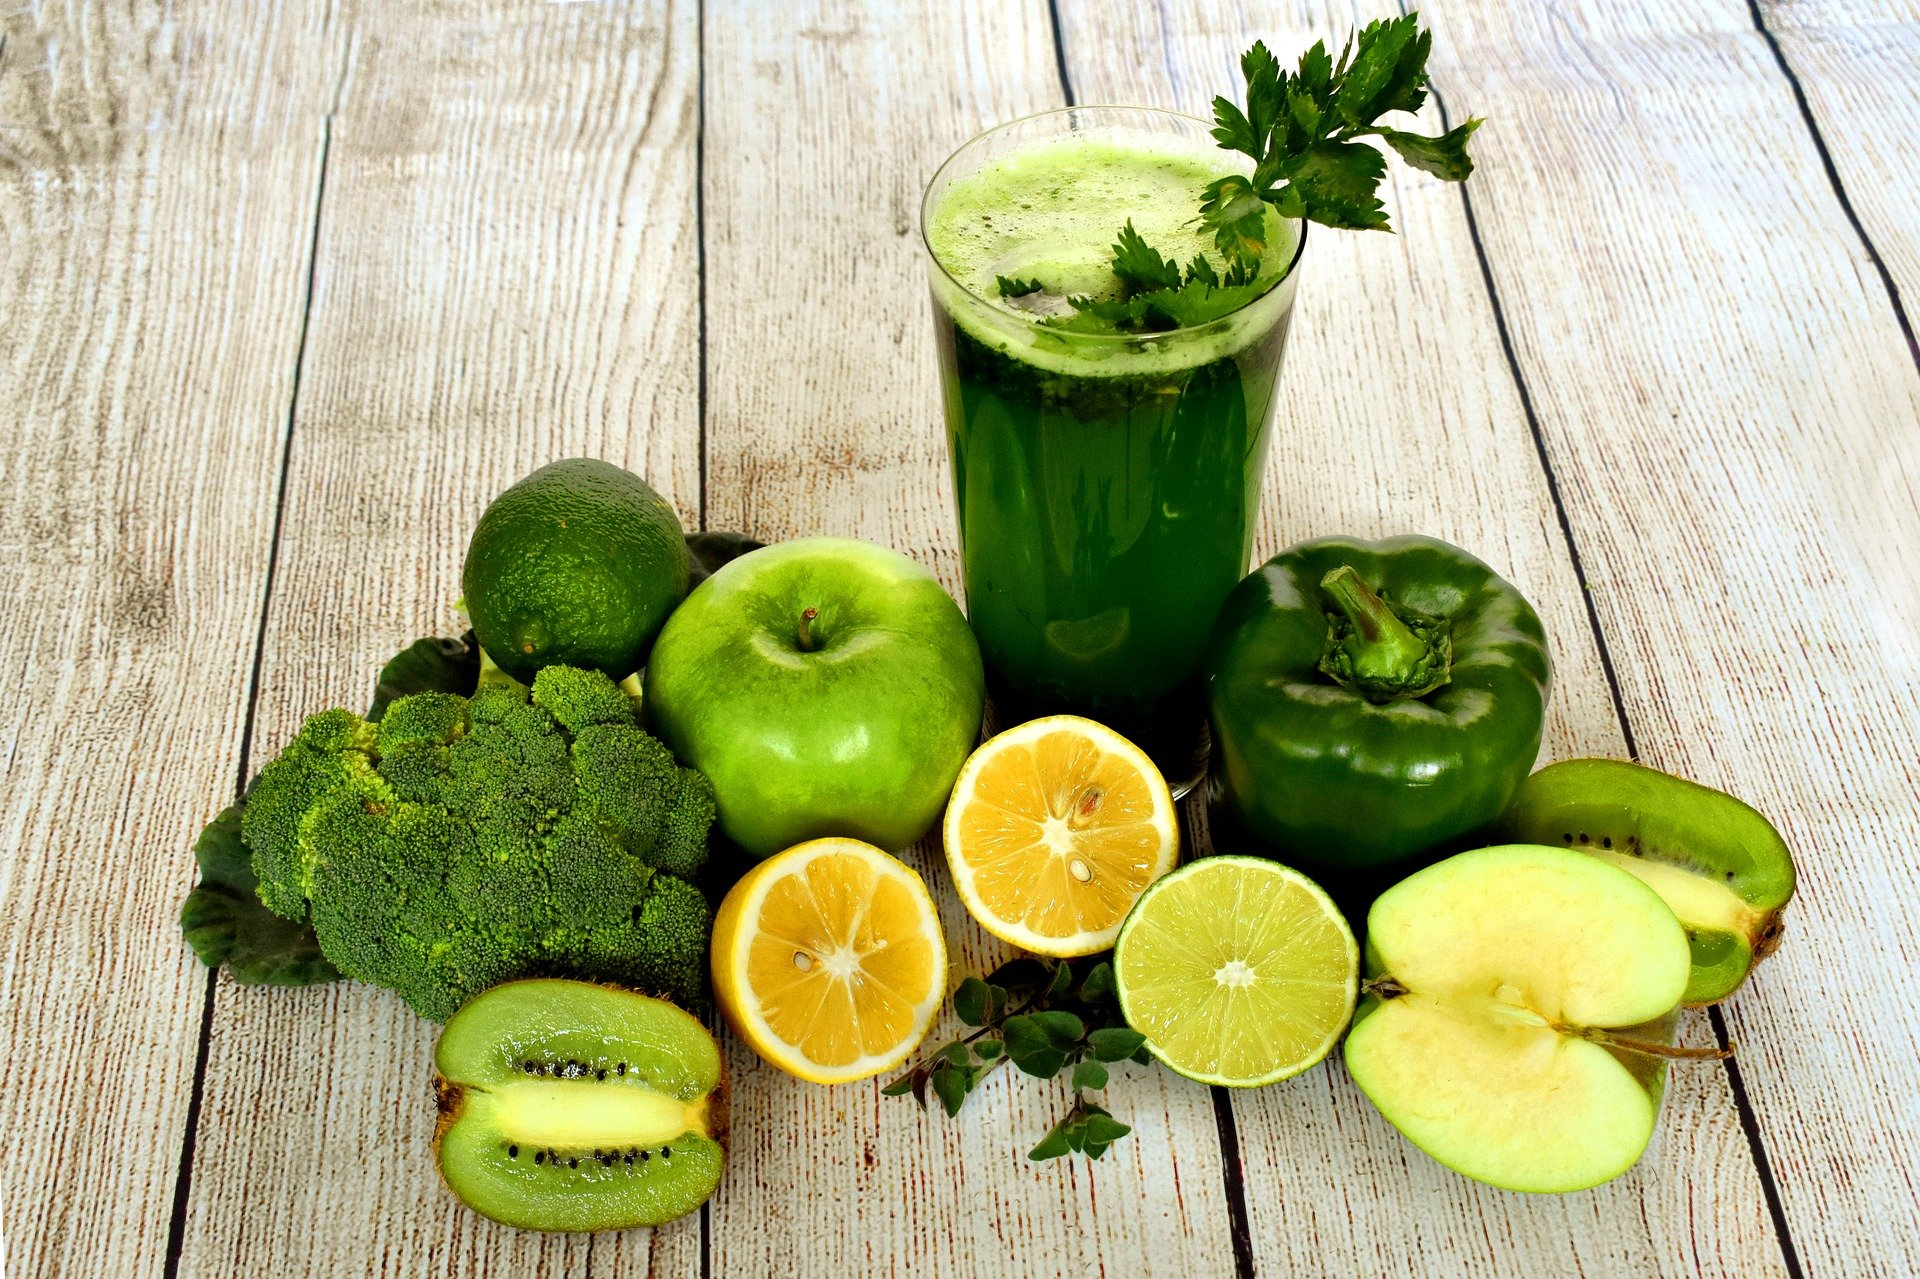 Bio-Hydrixir-Energie-Getränk - Kaufideen. Beste Bio-Hydrixir-Energie-Getränke finden